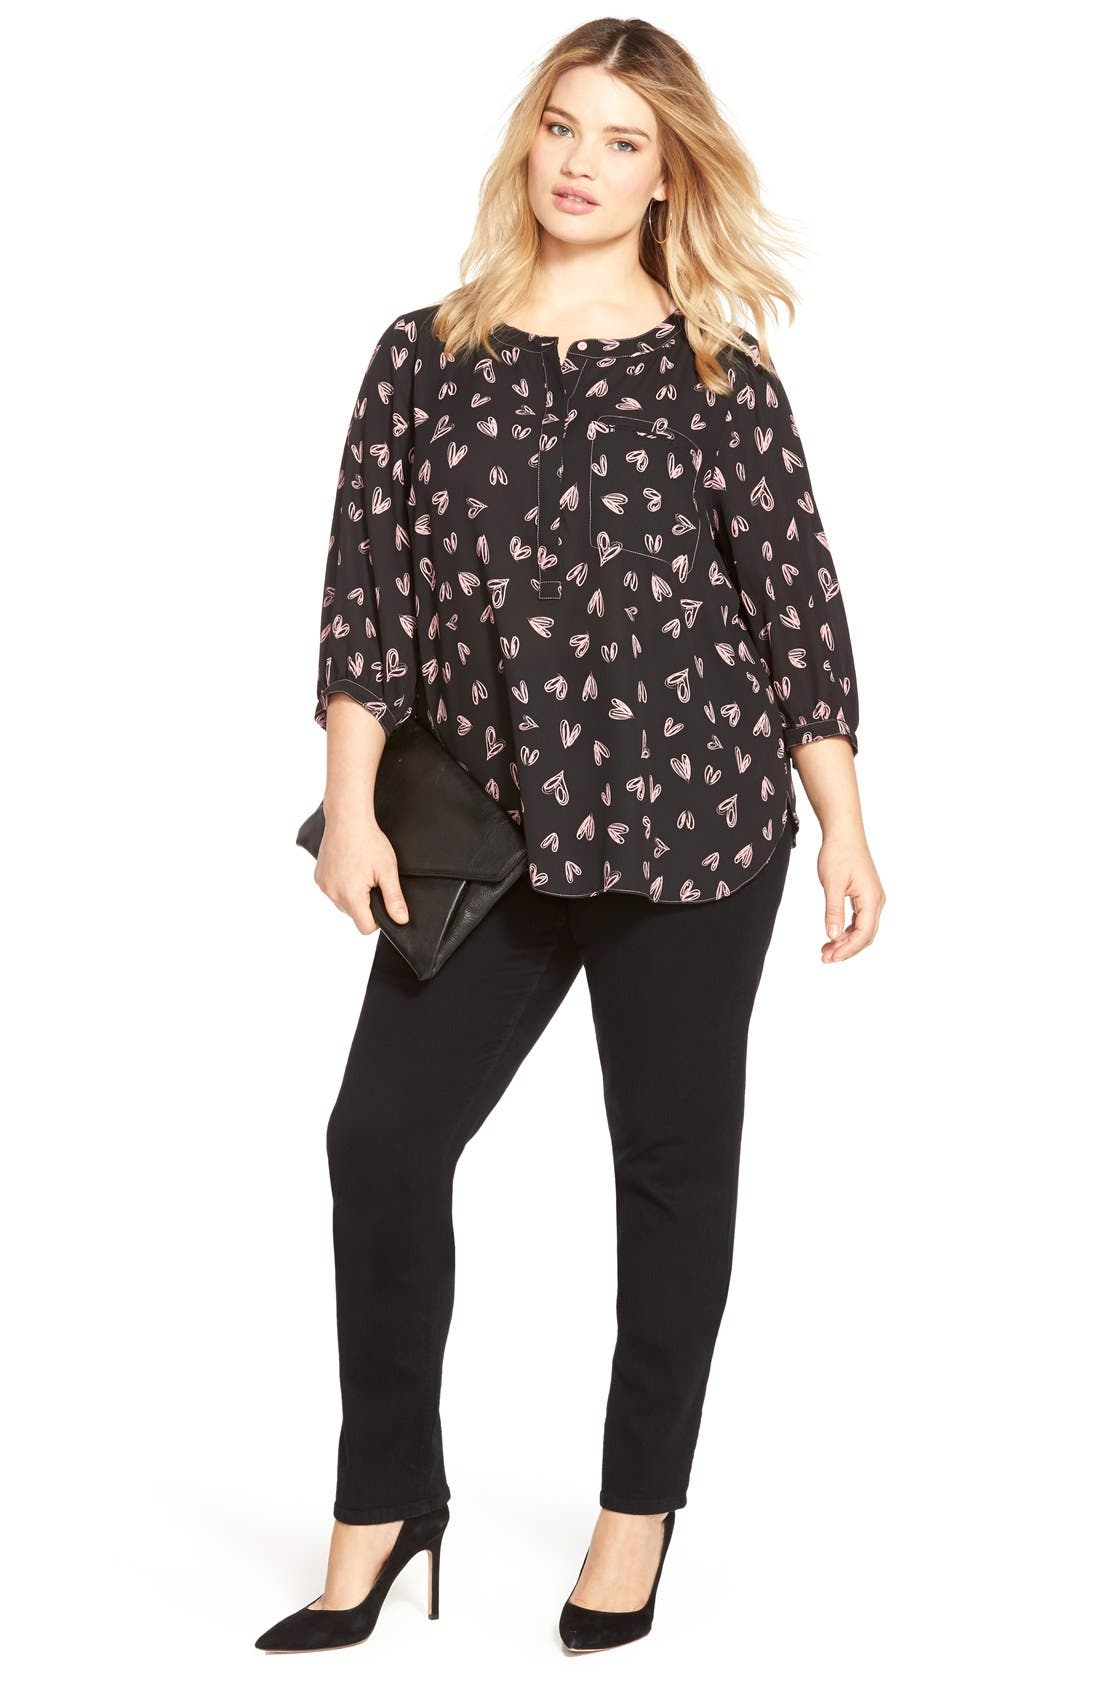 NYDJ Top & Straight Leg Jeans (Plus Size)